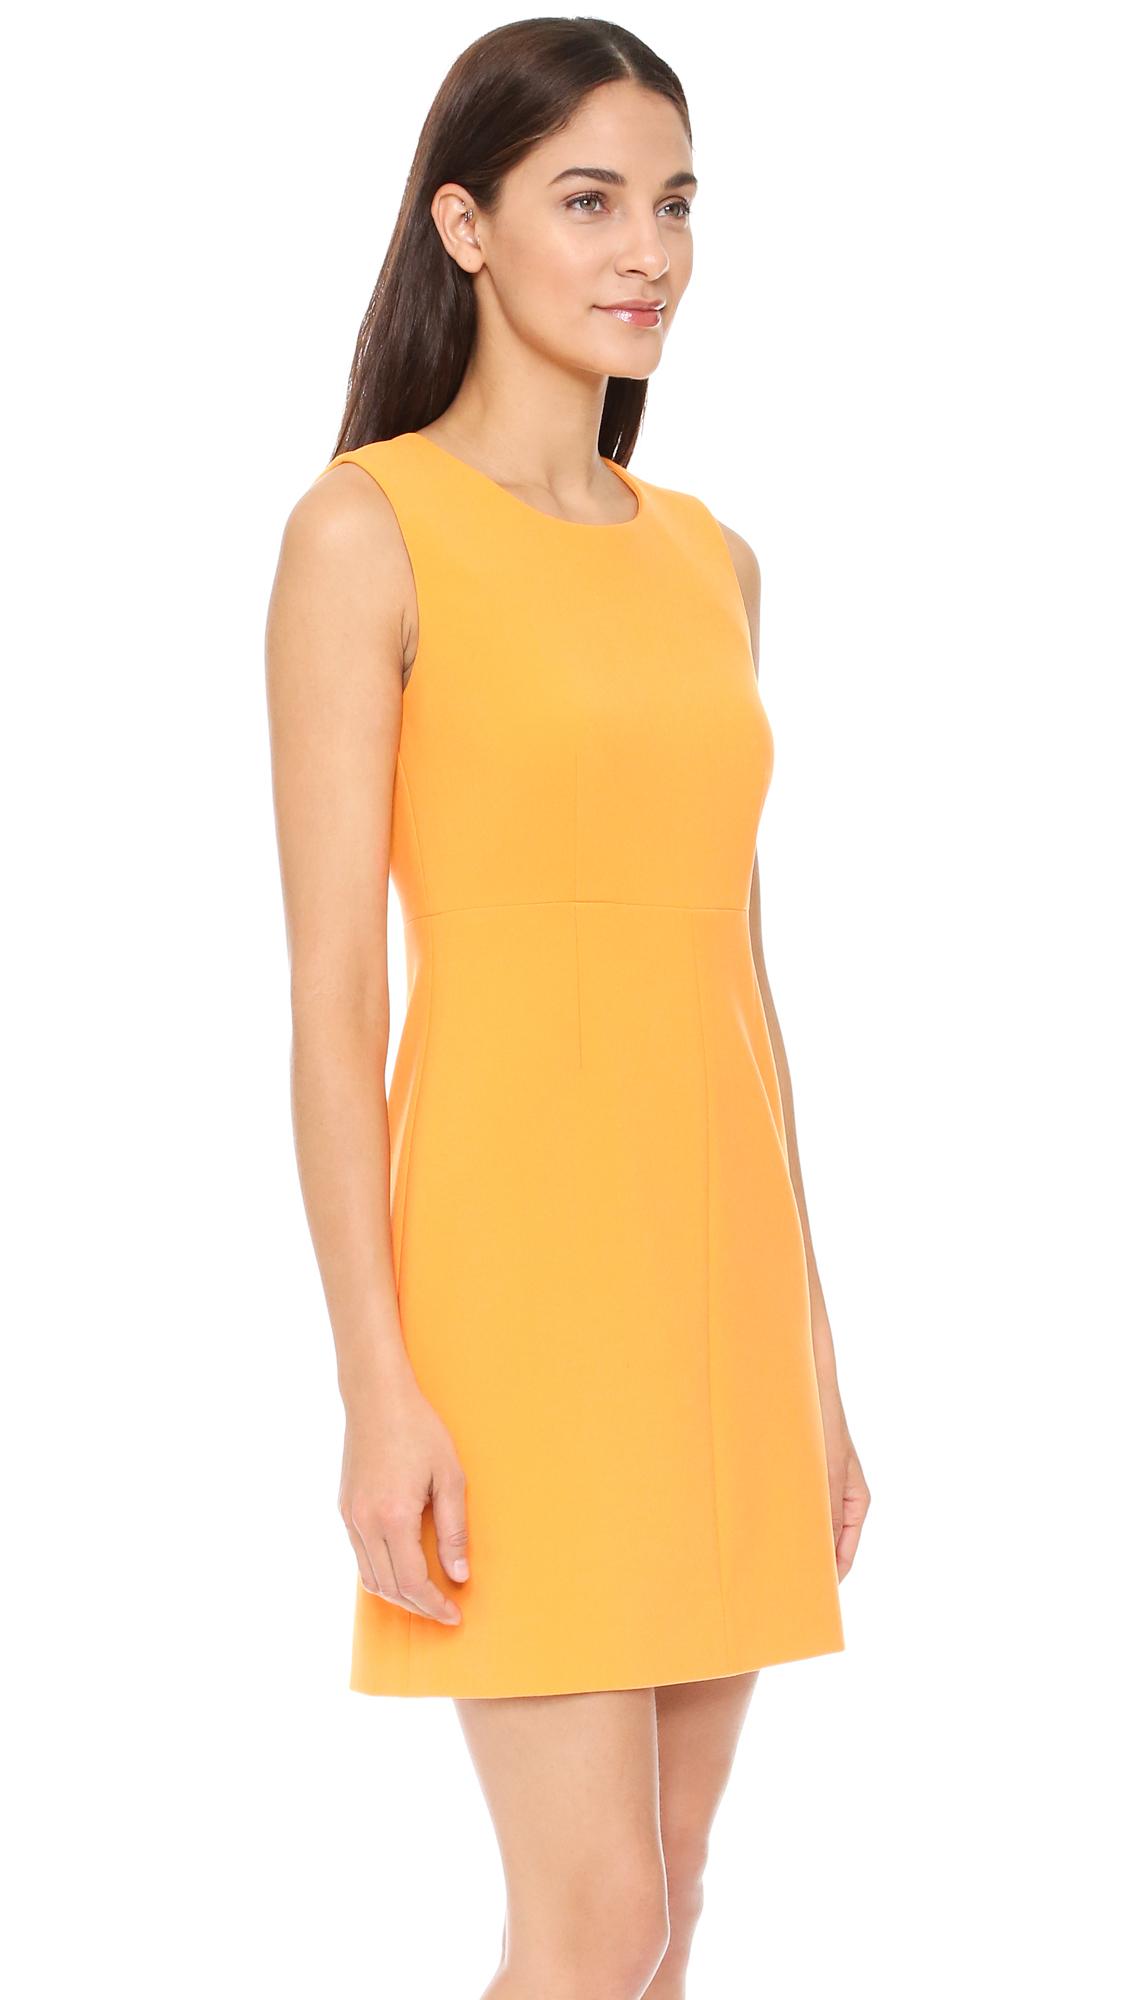 diane von furstenberg carrie dress in orange lyst. Black Bedroom Furniture Sets. Home Design Ideas